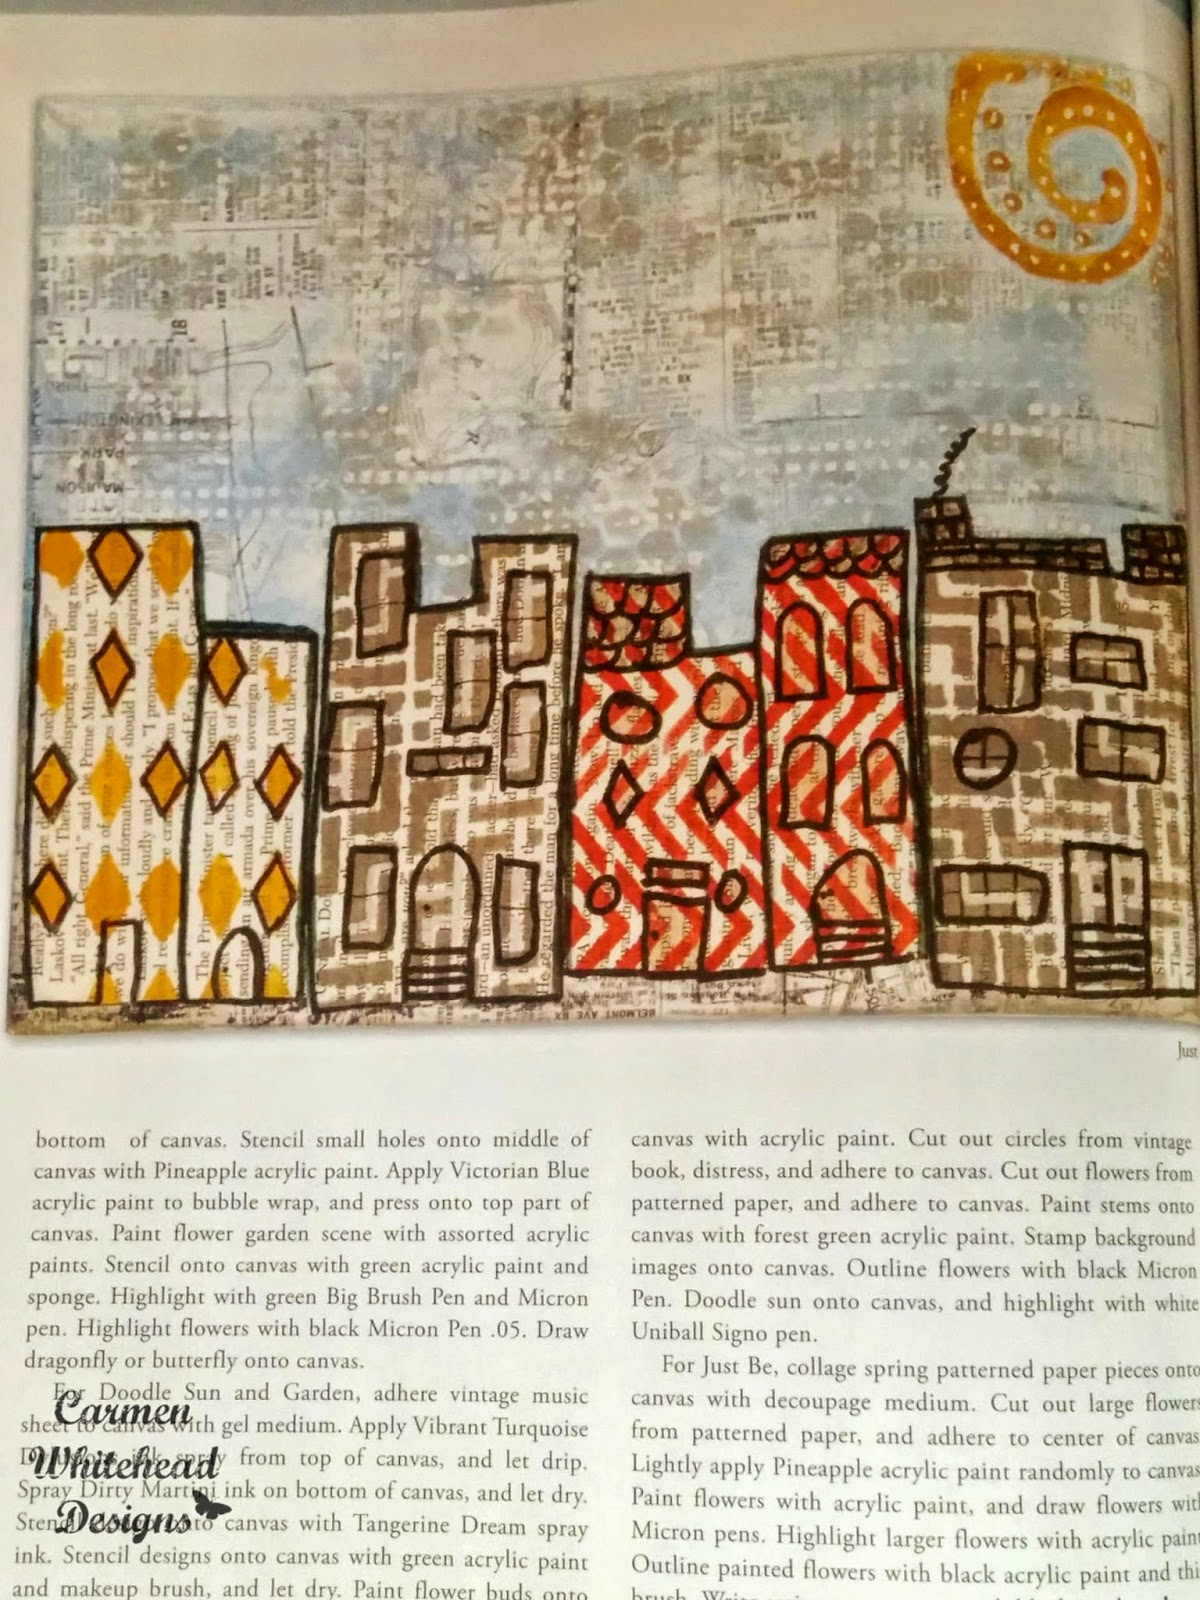 Winter 2015 Somerset Studio Gallery, Carmen Whitehead Designs published